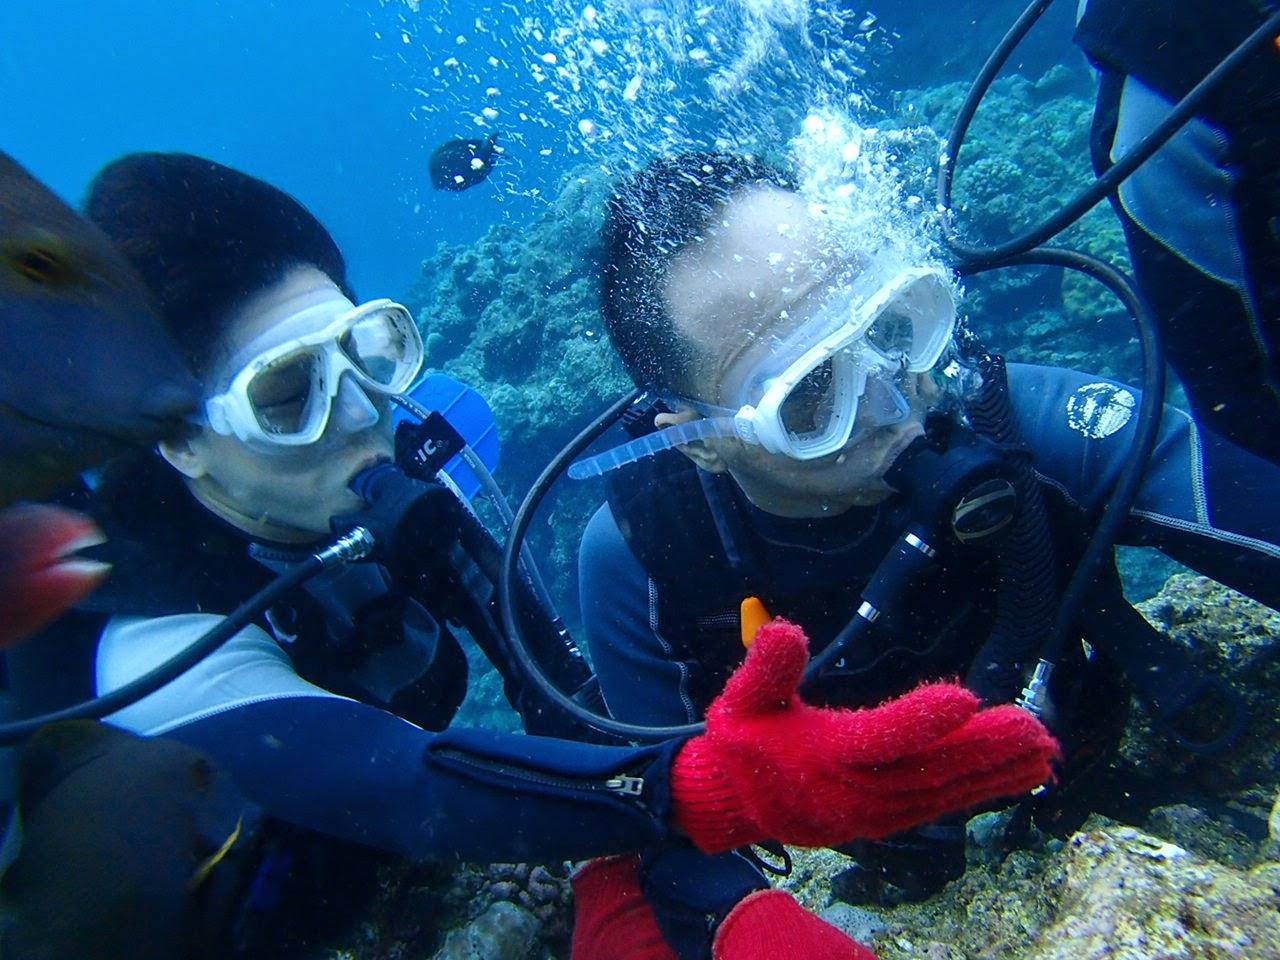 gladysliu: 沖繩自駕遊2014 Monterey Vacation(08)~青洞潛水篇@Natural Blue